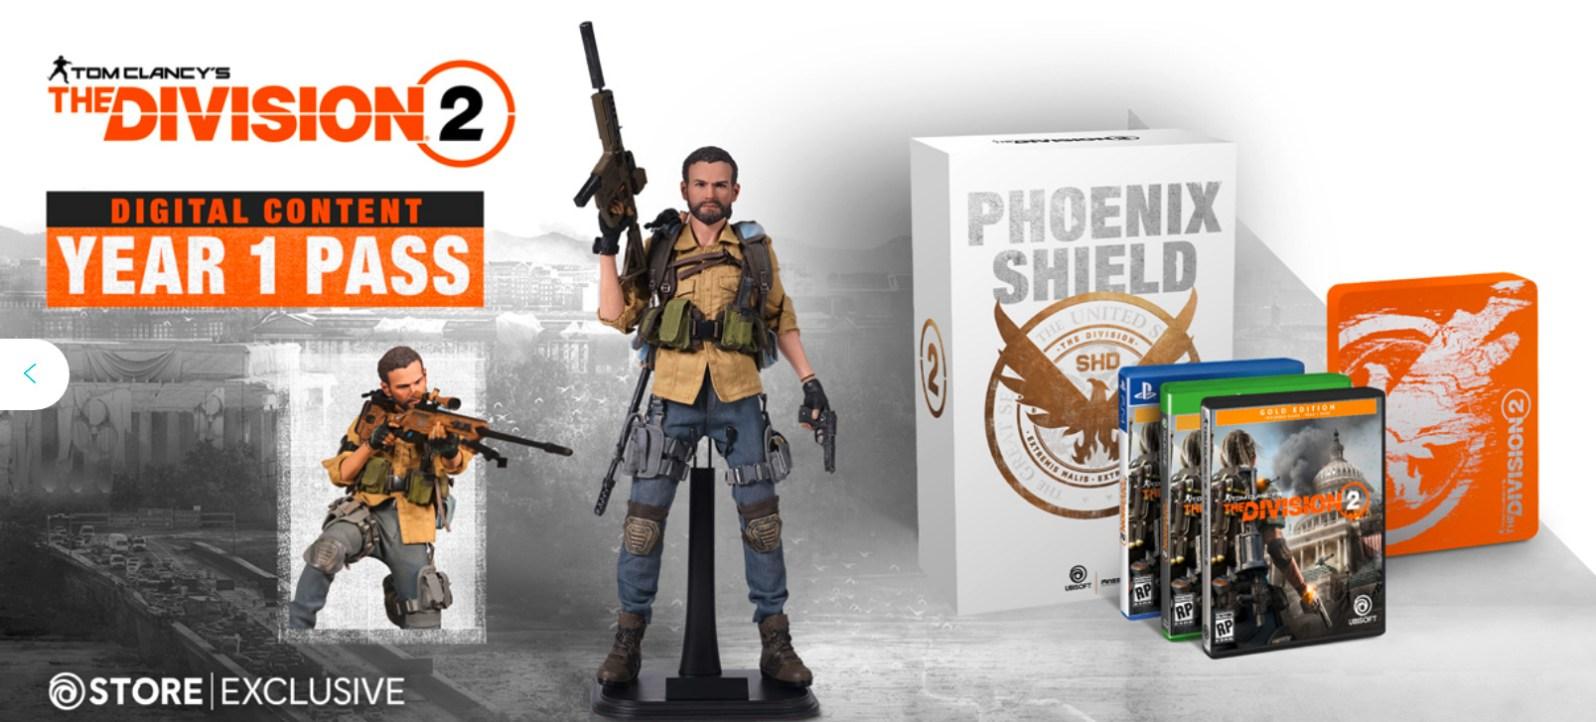 Quelle: blog.ubi.com - Tom Clancy's The Division 2 - Versionen